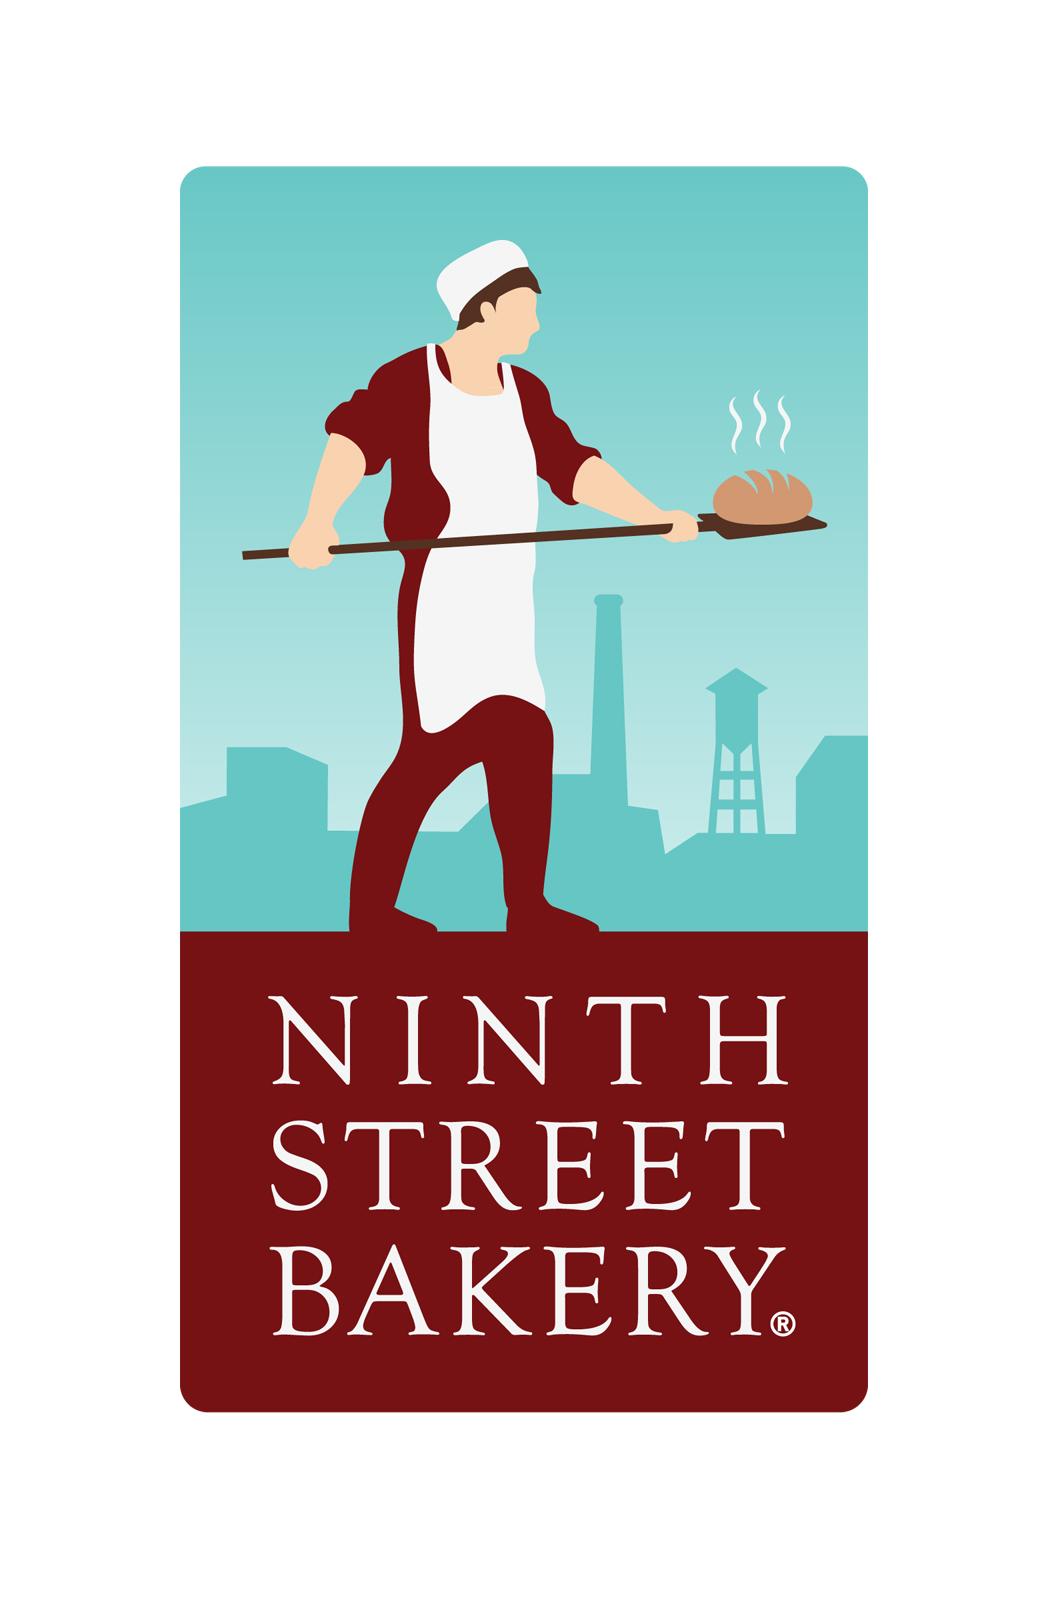 ninth street bakery gradient final.jpg